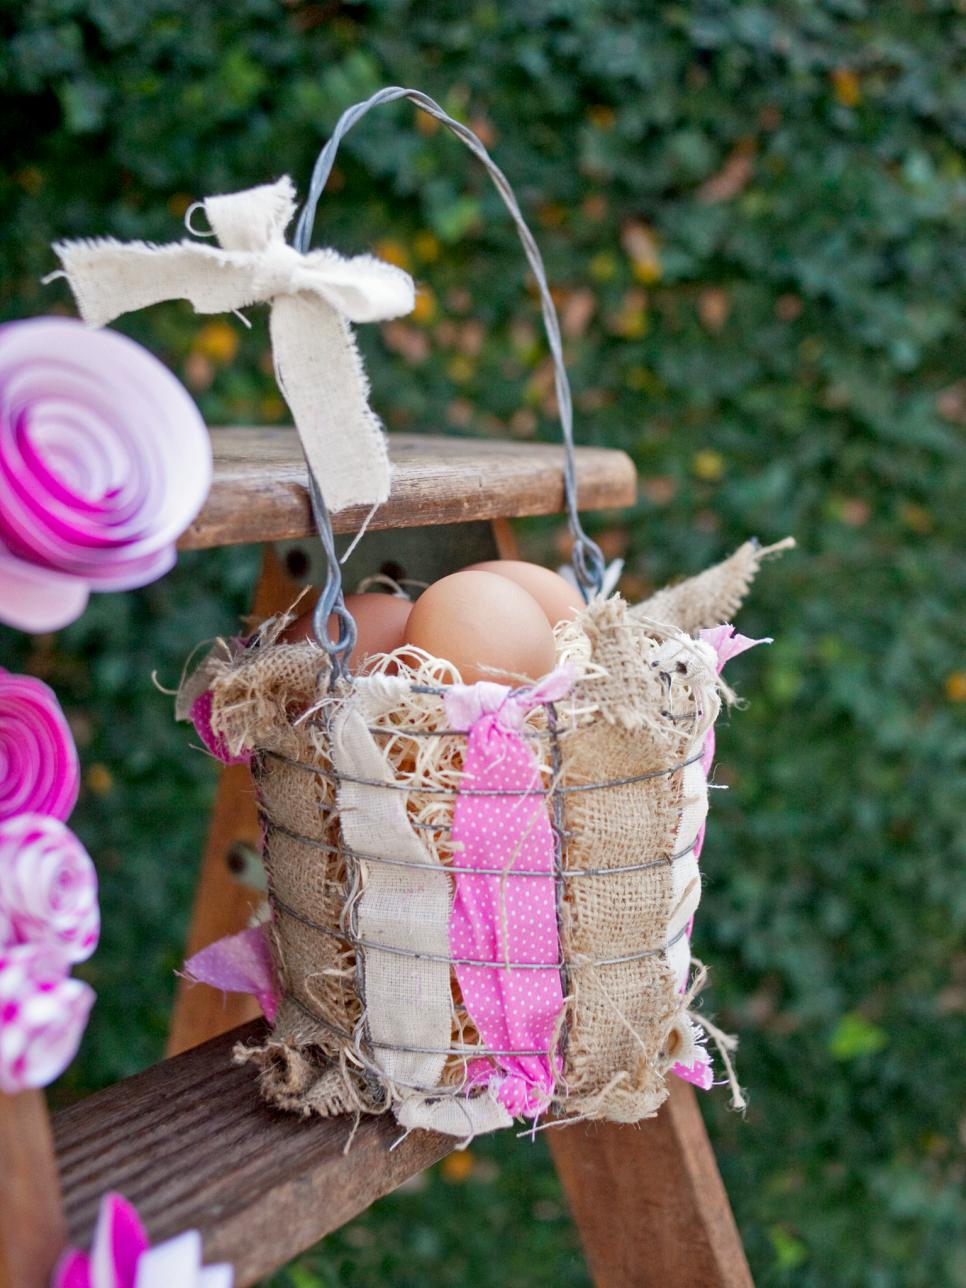 Original Abigail Barnes PaperandCake wire barn easter basket v.jpg.rend.hgtvcom.966.1288